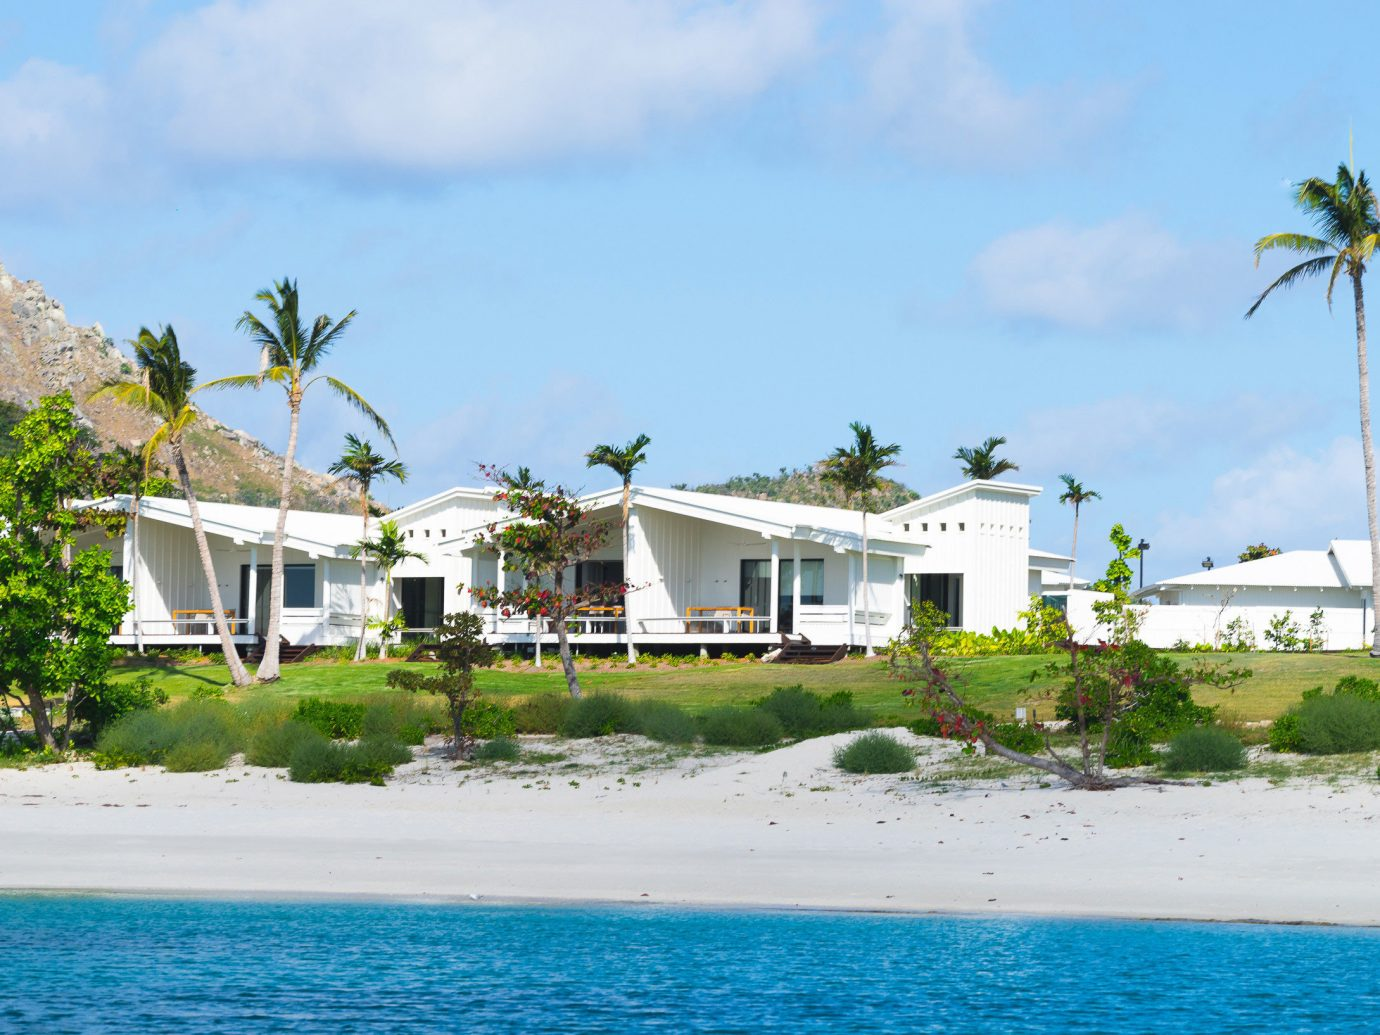 All-Inclusive Resorts Hotels sky water Beach property house caribbean Sea Coast shore Ocean Resort Island Lagoon swimming pool Village tropics cove cape